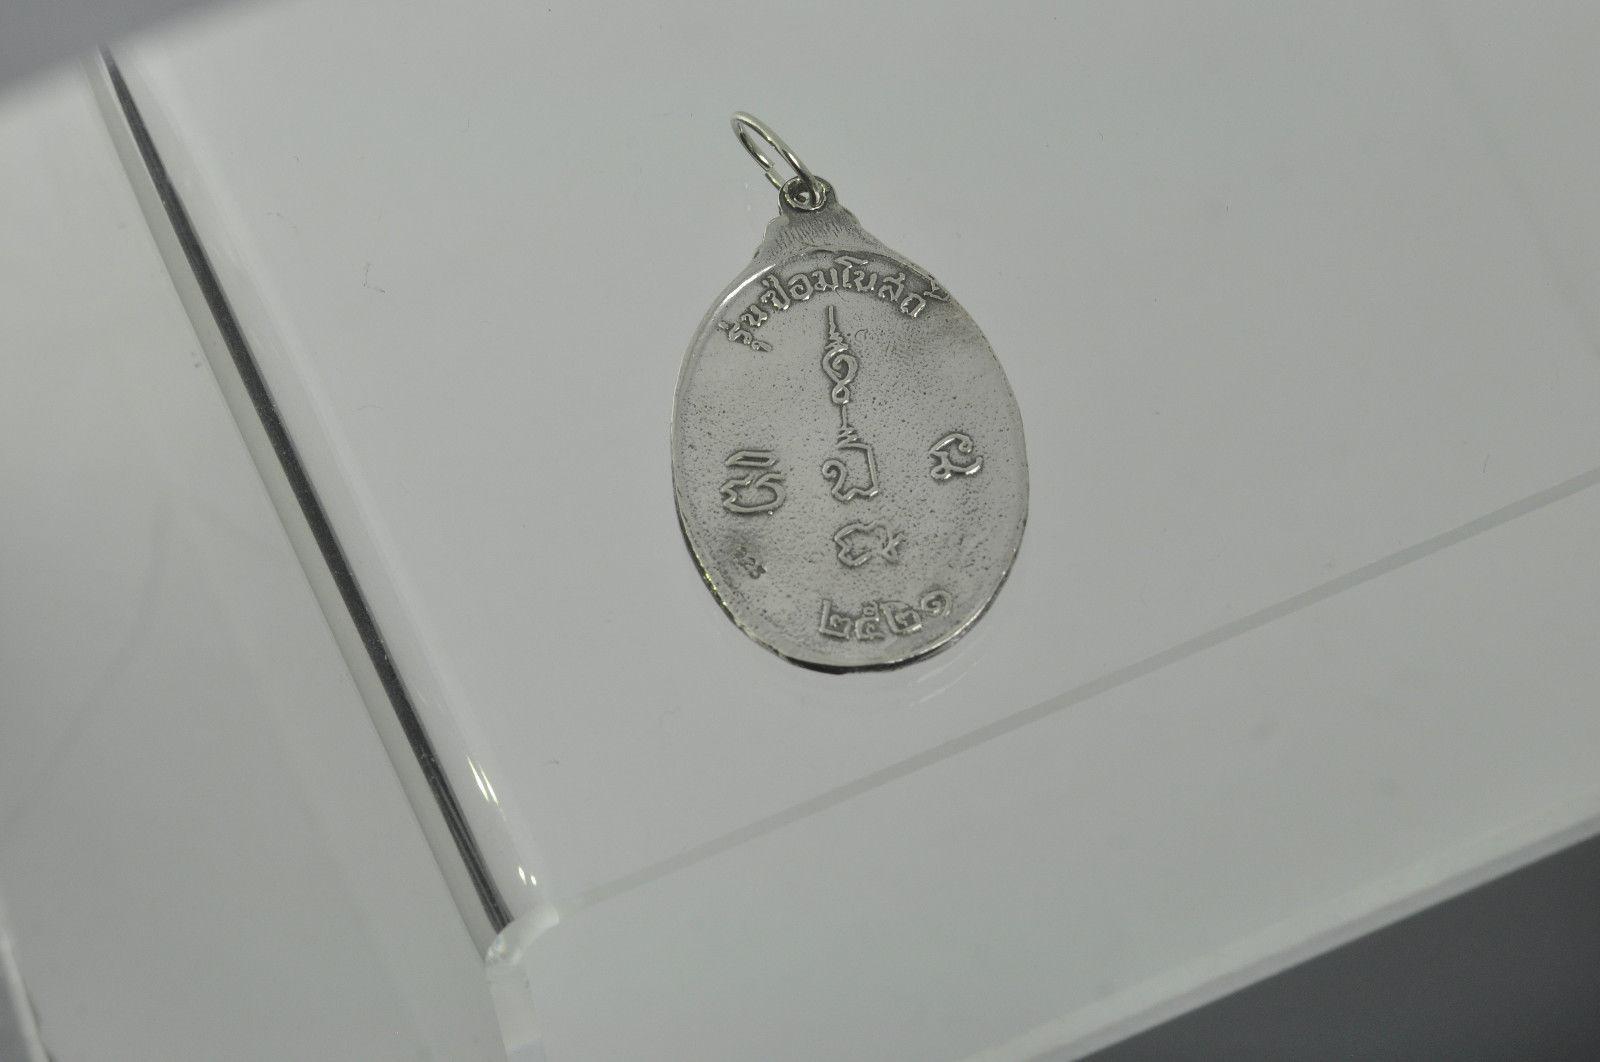 Gautama Founding figure Buddha buddhism Sterling Silver .925 Charm Jewelry